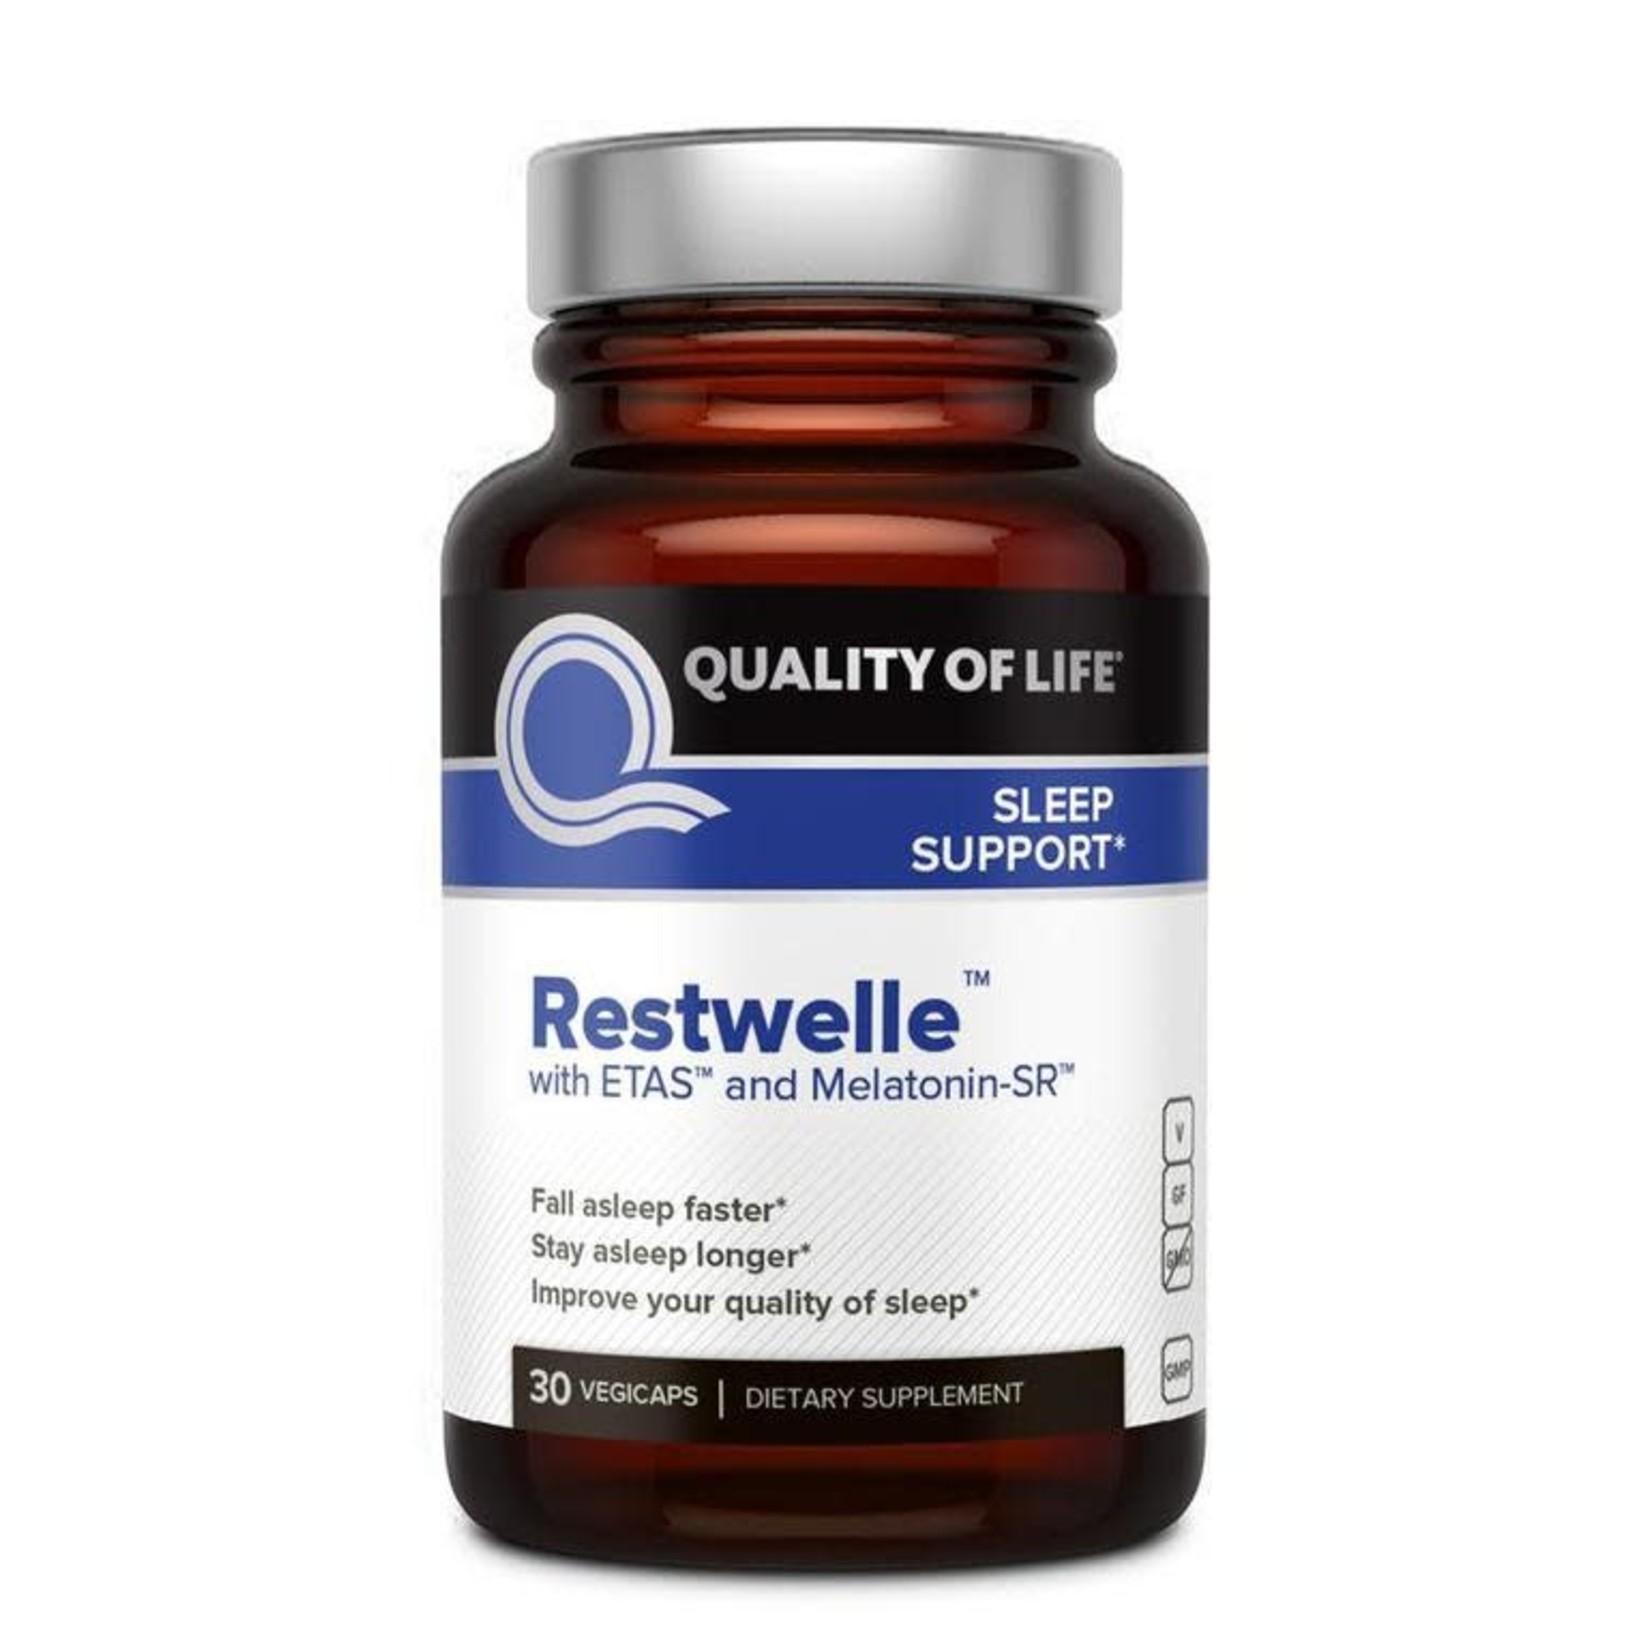 Quality of Life QOL Restwelle with ETAS and Melatonin-SR 30ct